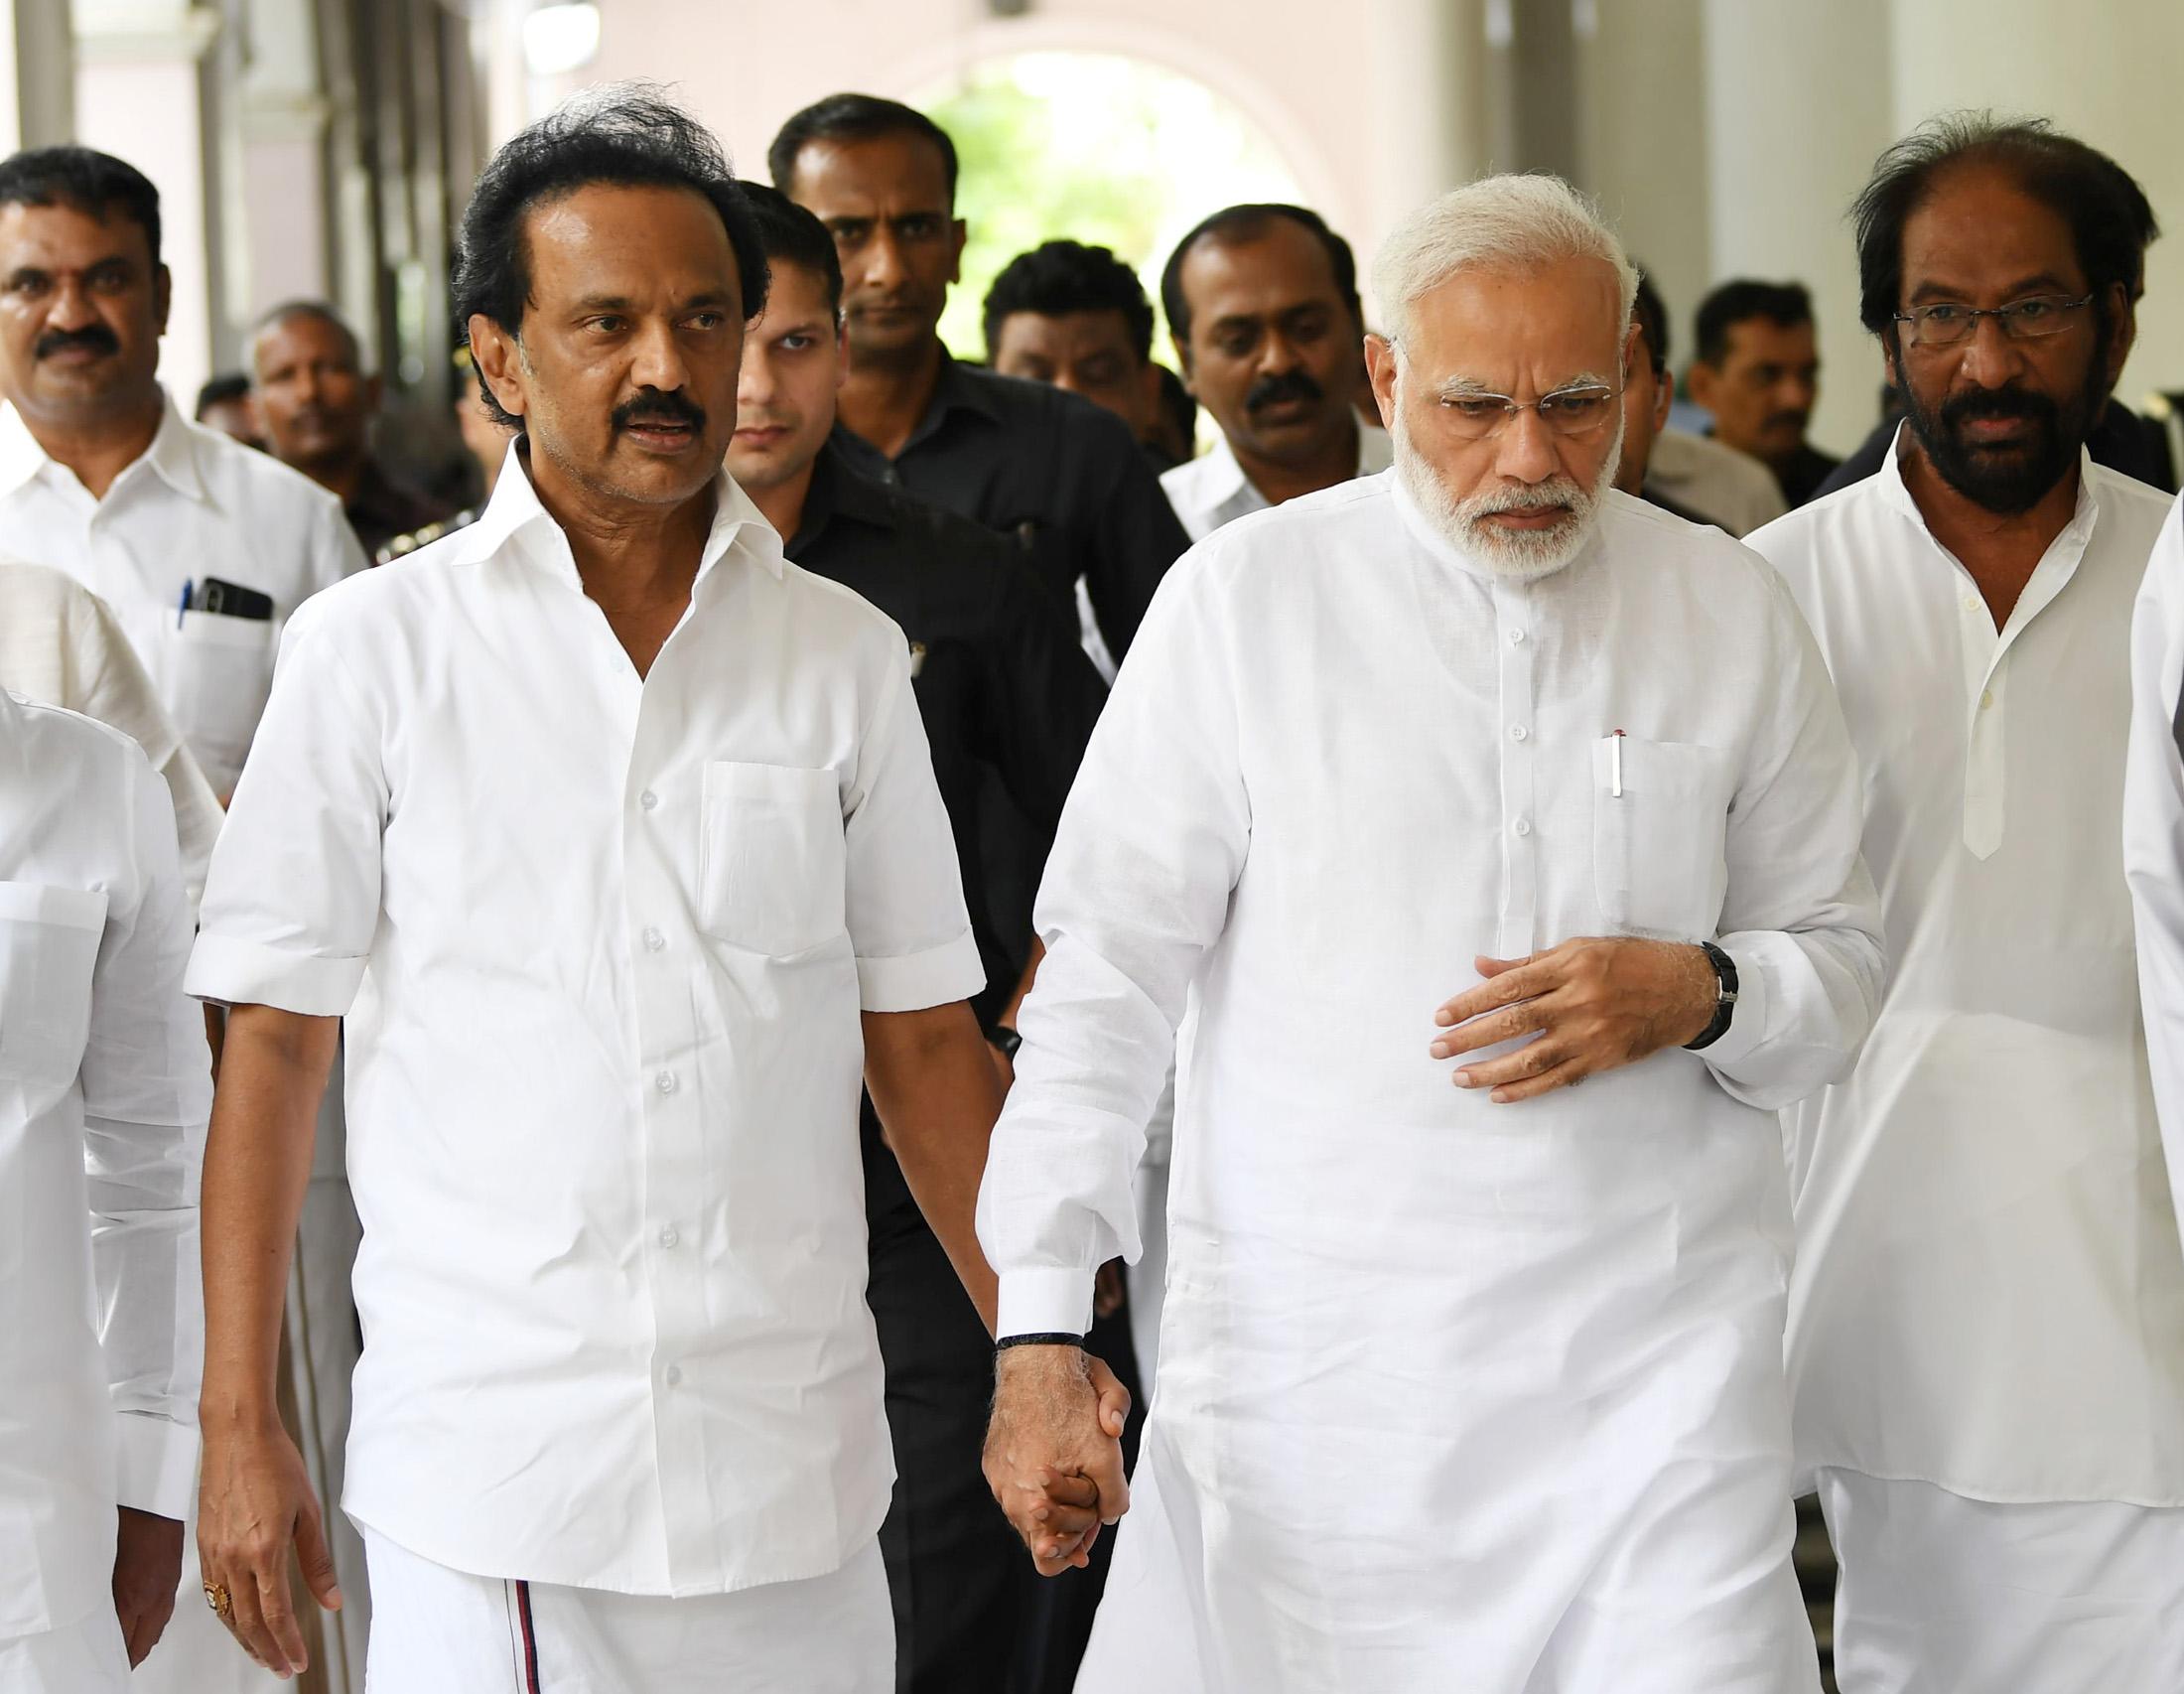 Dravida Munnetra Kazhagam, MK Stalin, DMK, Prime Minister, Narendra Modi, Atal Bihari Vajpyee, BJP, NewsMobile, Mobile, News, India